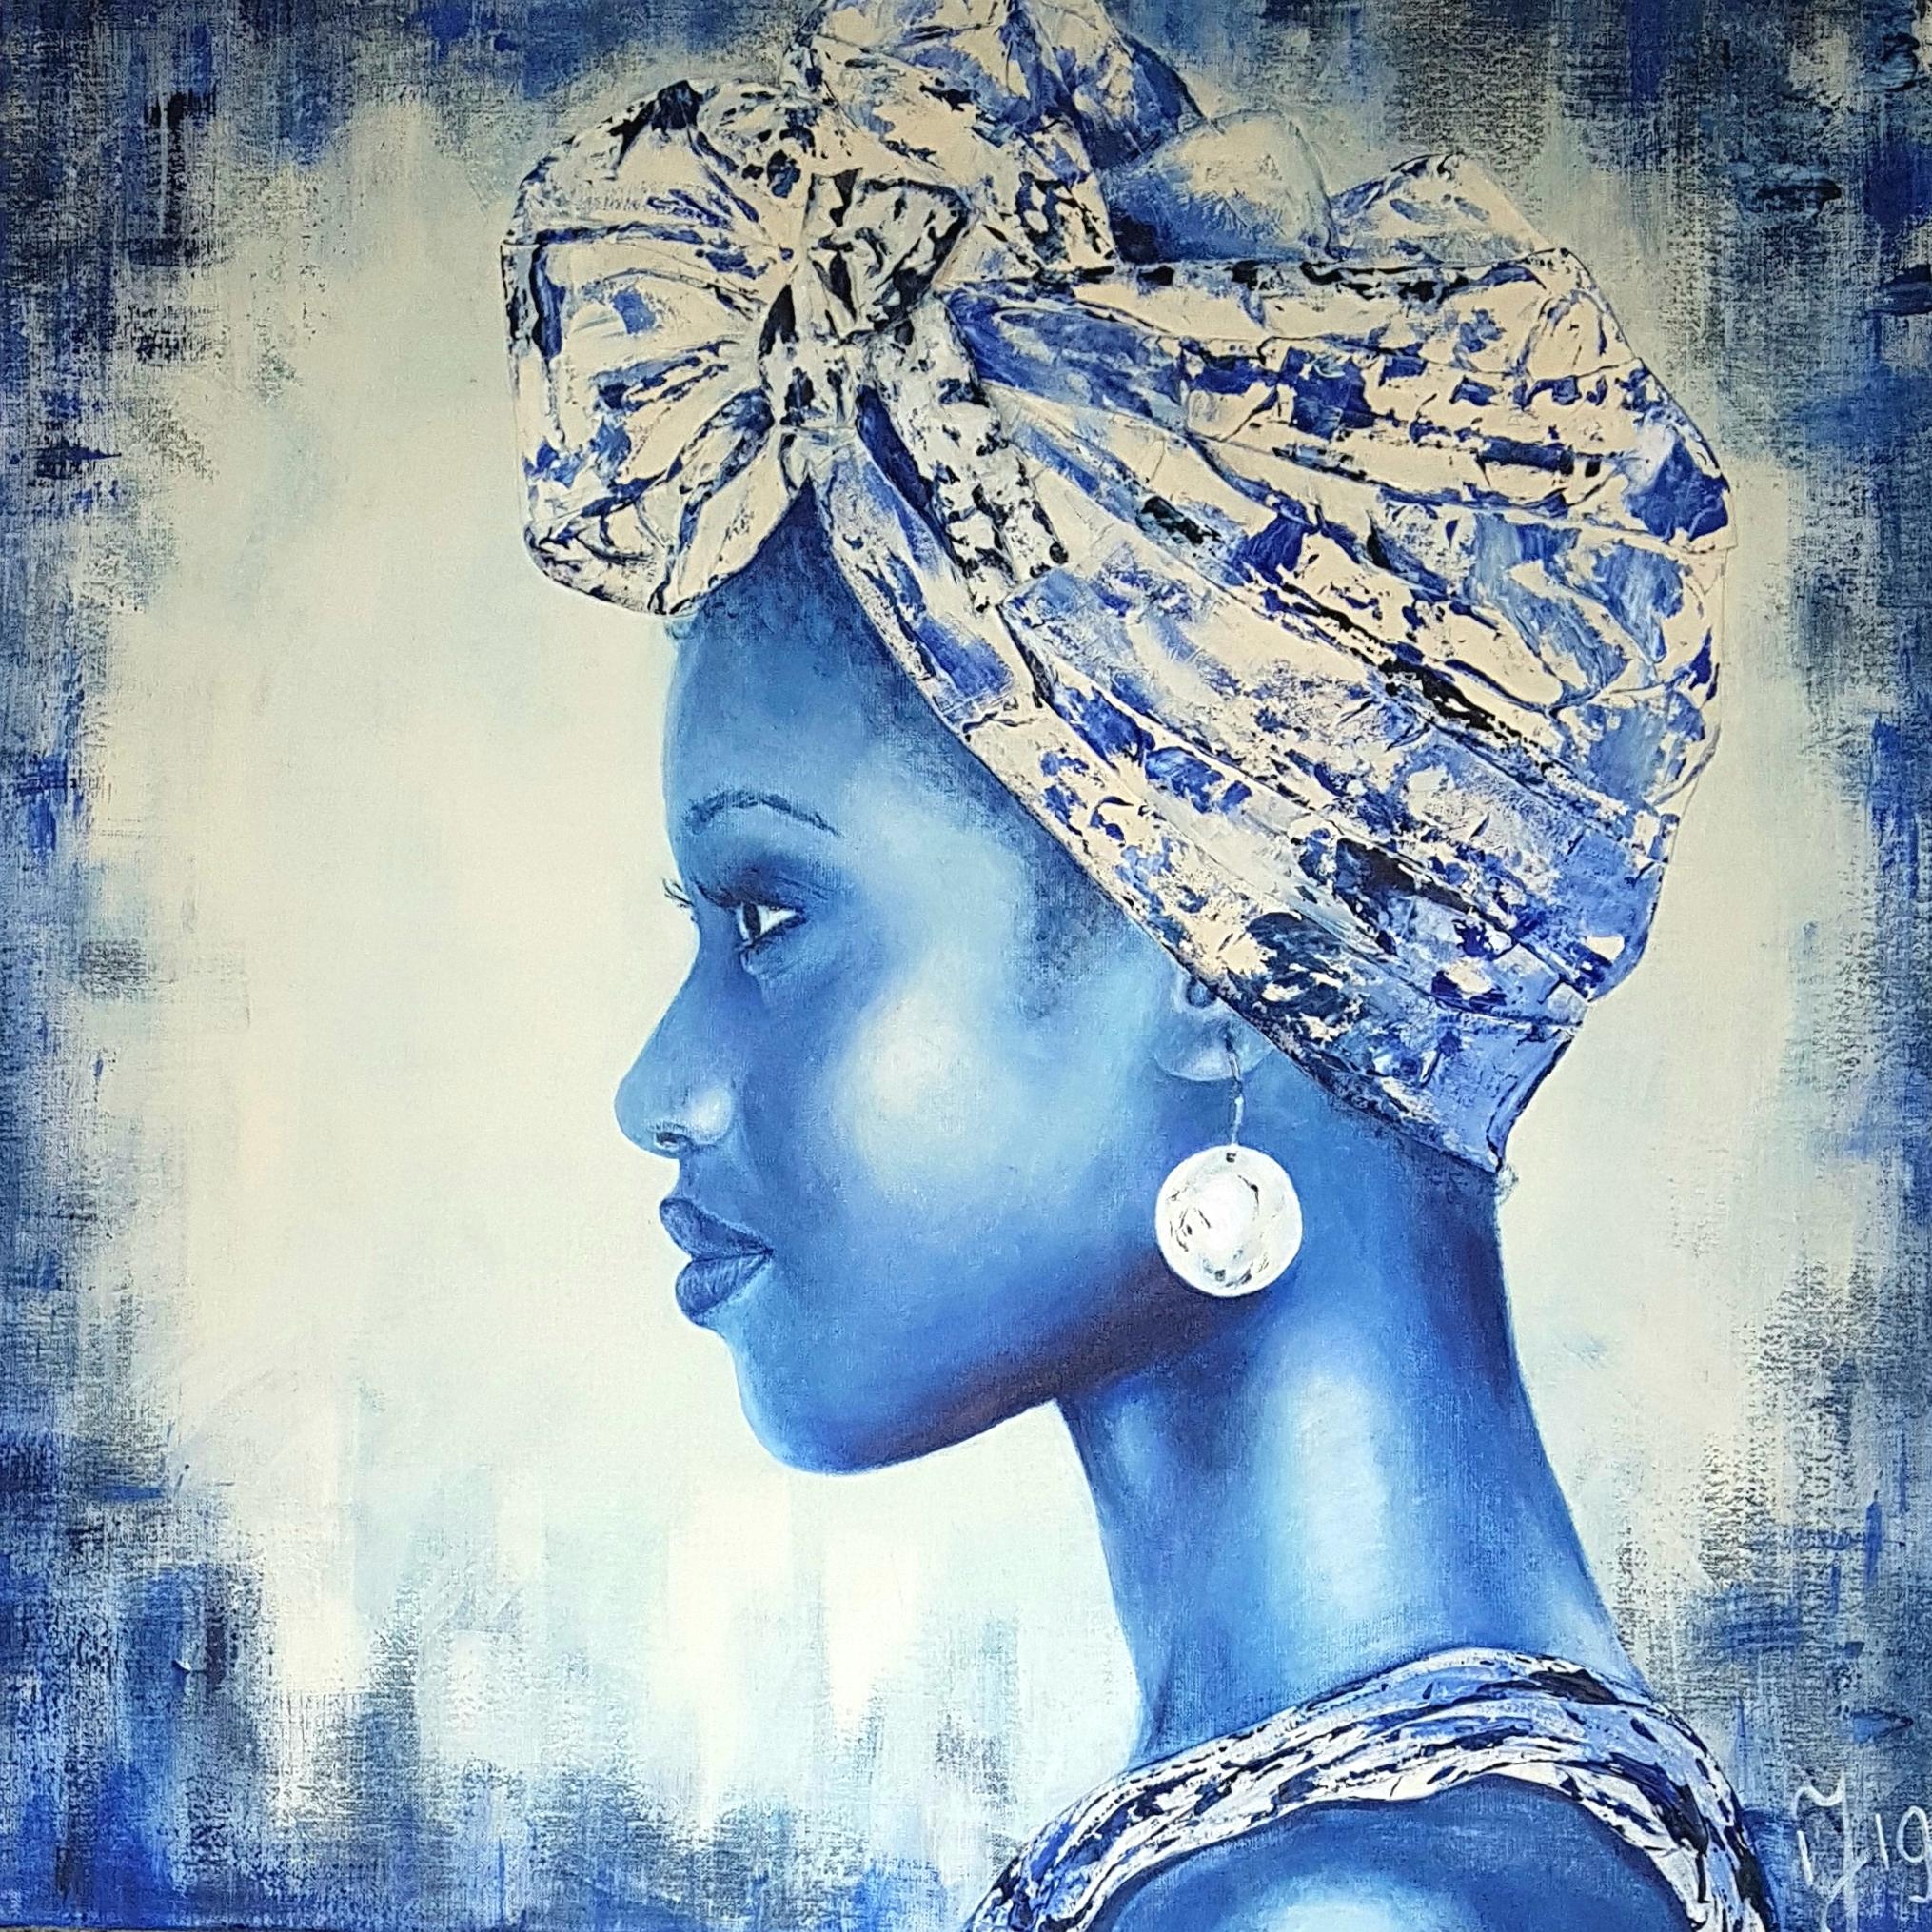 Delft Blue In Africa 1 | Portretten | 90x90 | Acryl Op Linnen | Momenteel Niet Beschikbaar